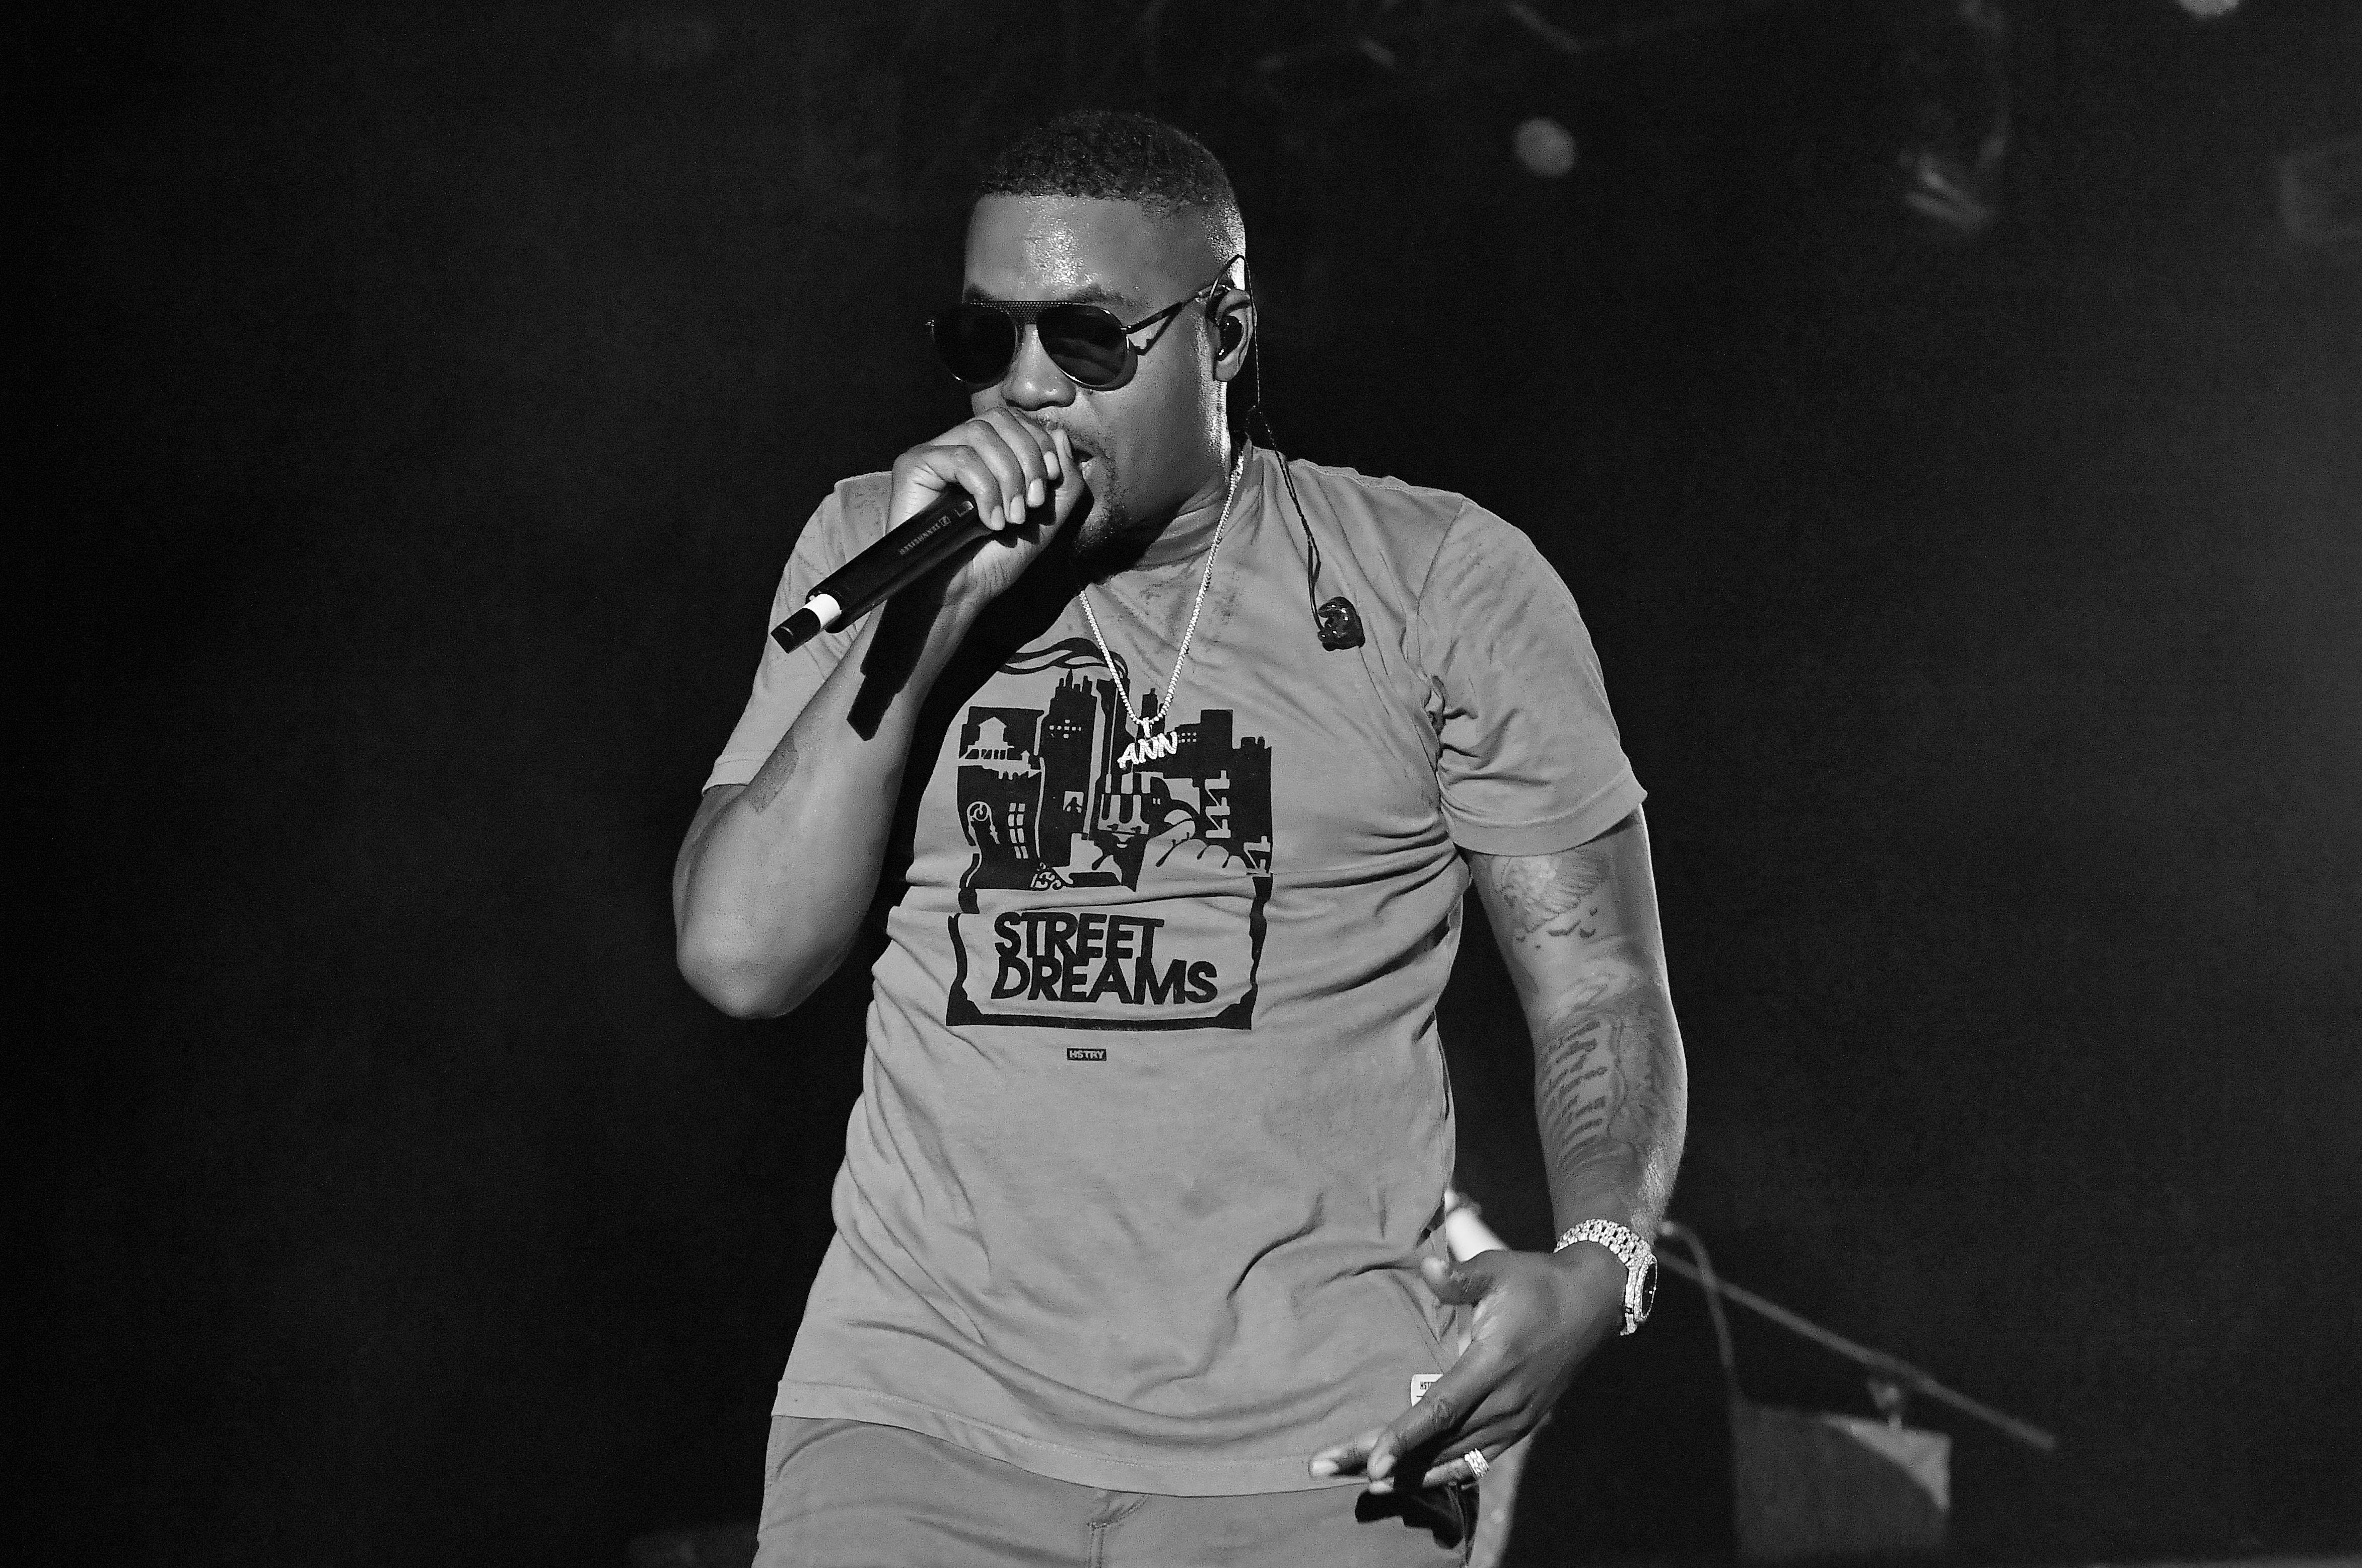 Funk Fest Atlanta 2018 - Day 1